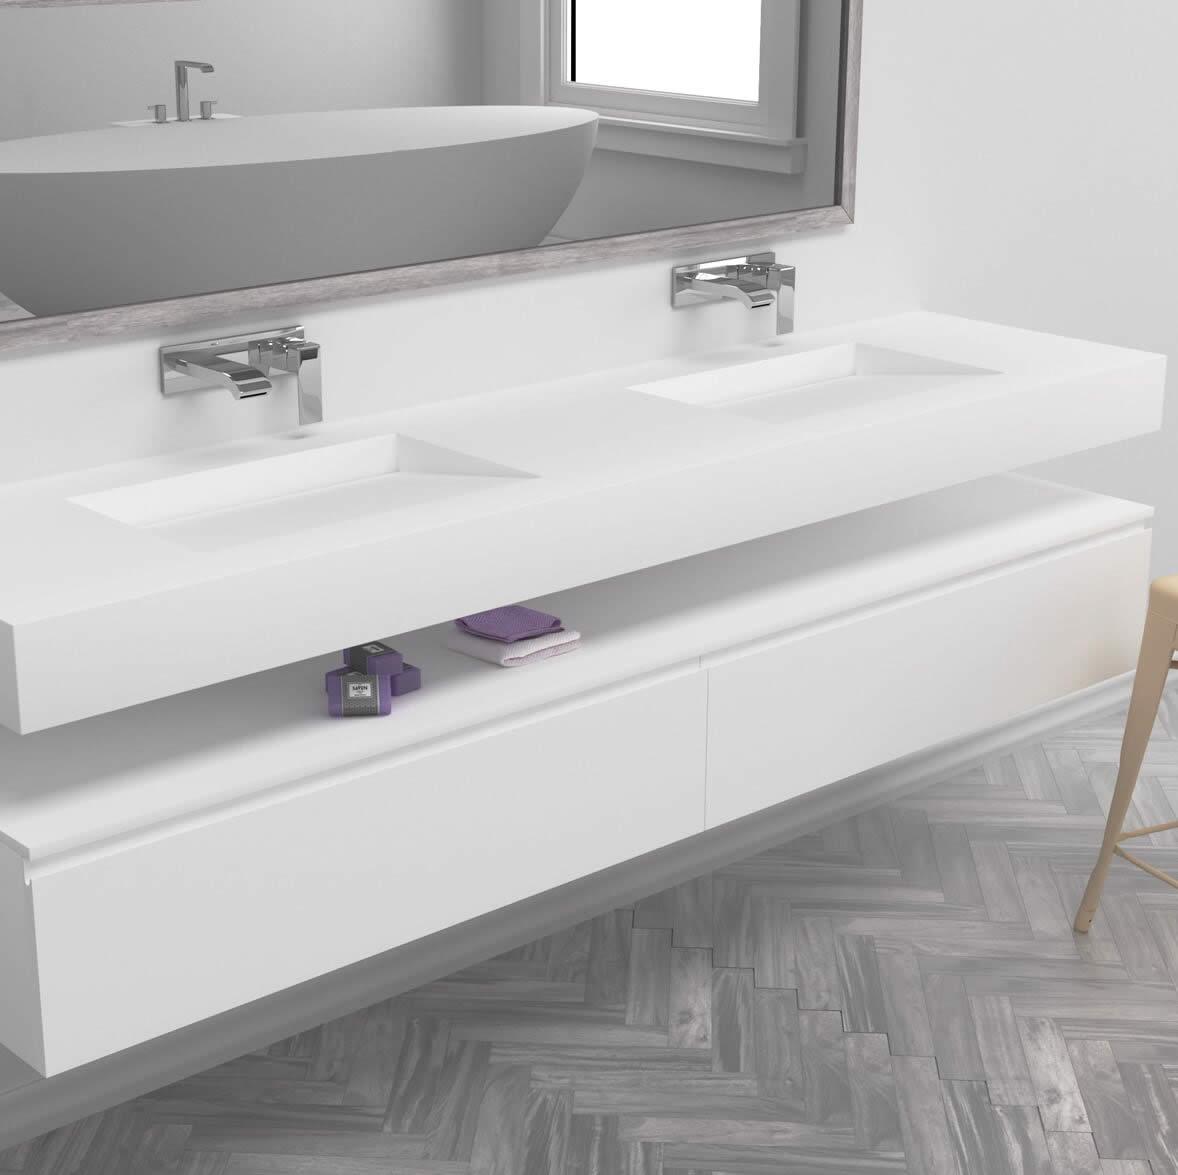 Double Sink Basins